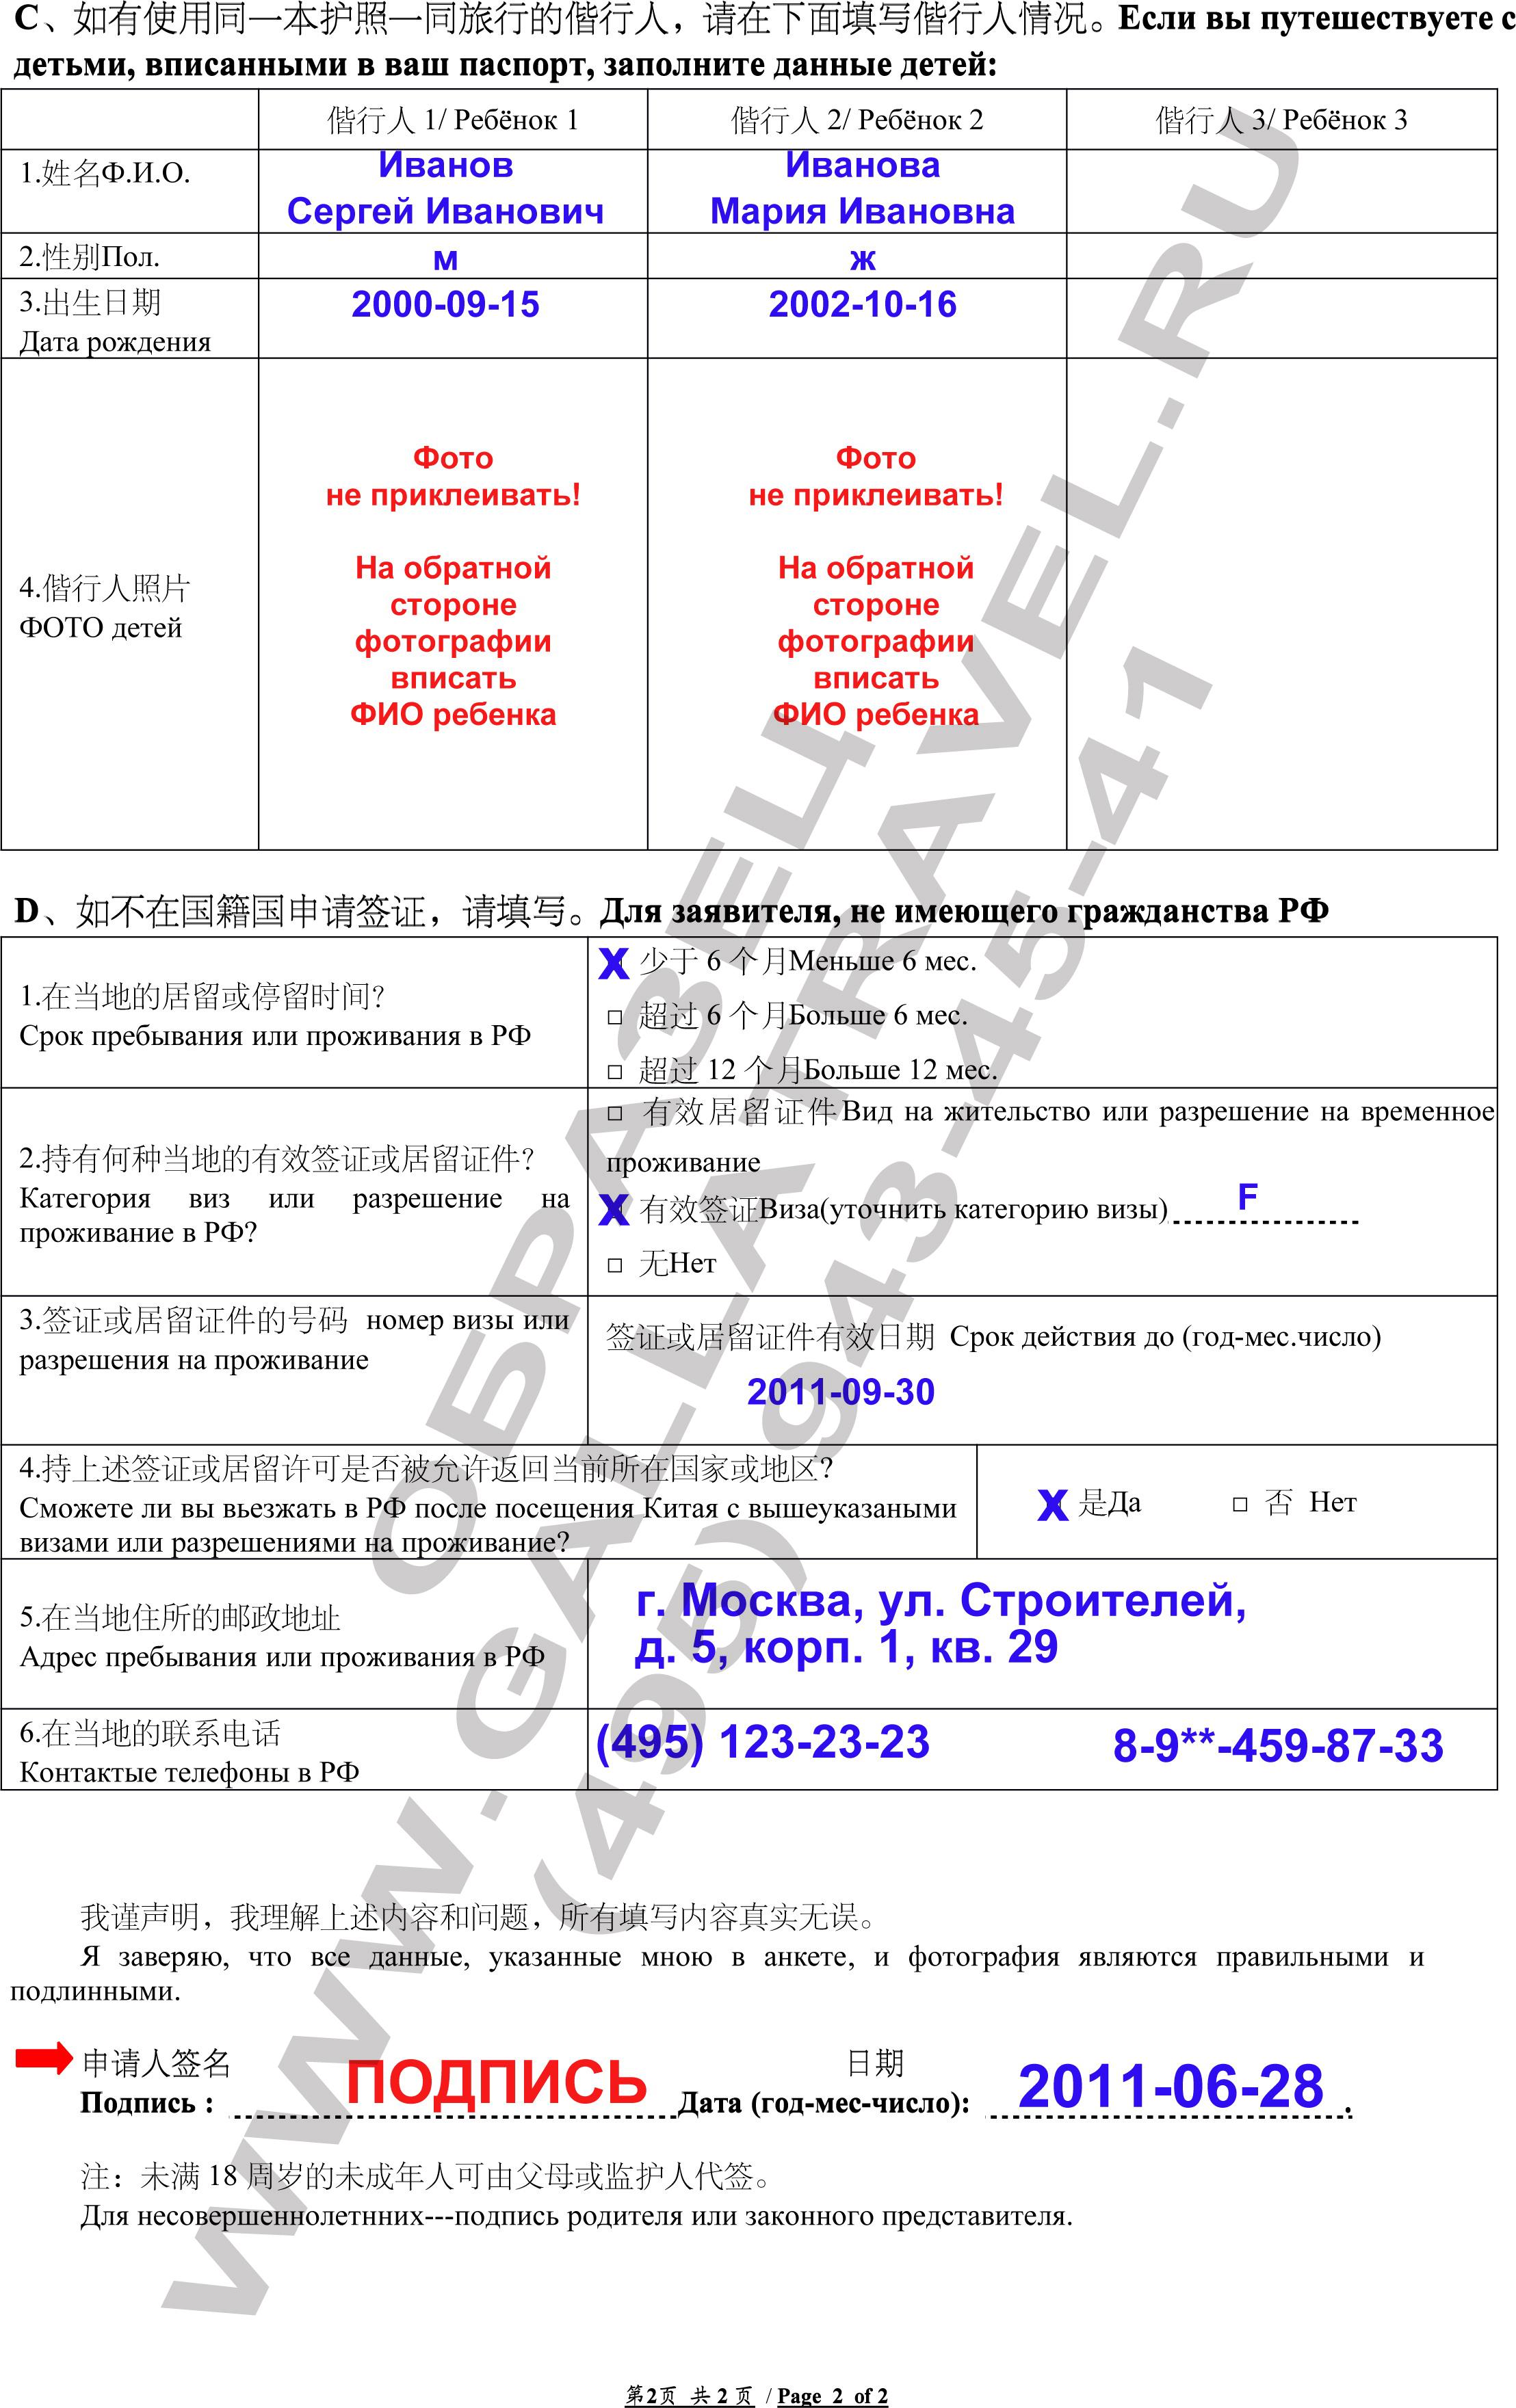 анкета на загранпаспорт 2013 бланк в украине